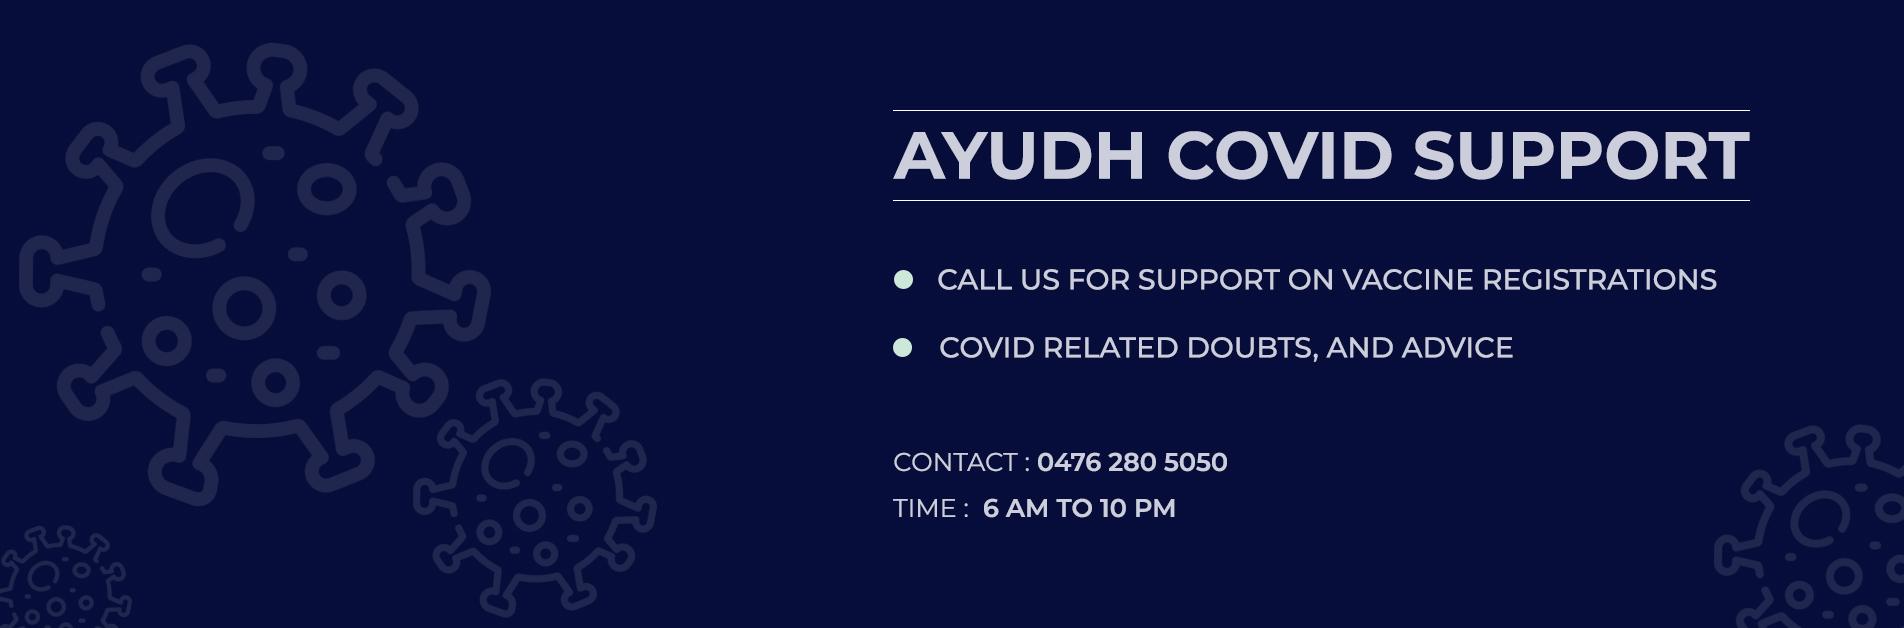 ayudh-home-page-banner-covid-19.jpg